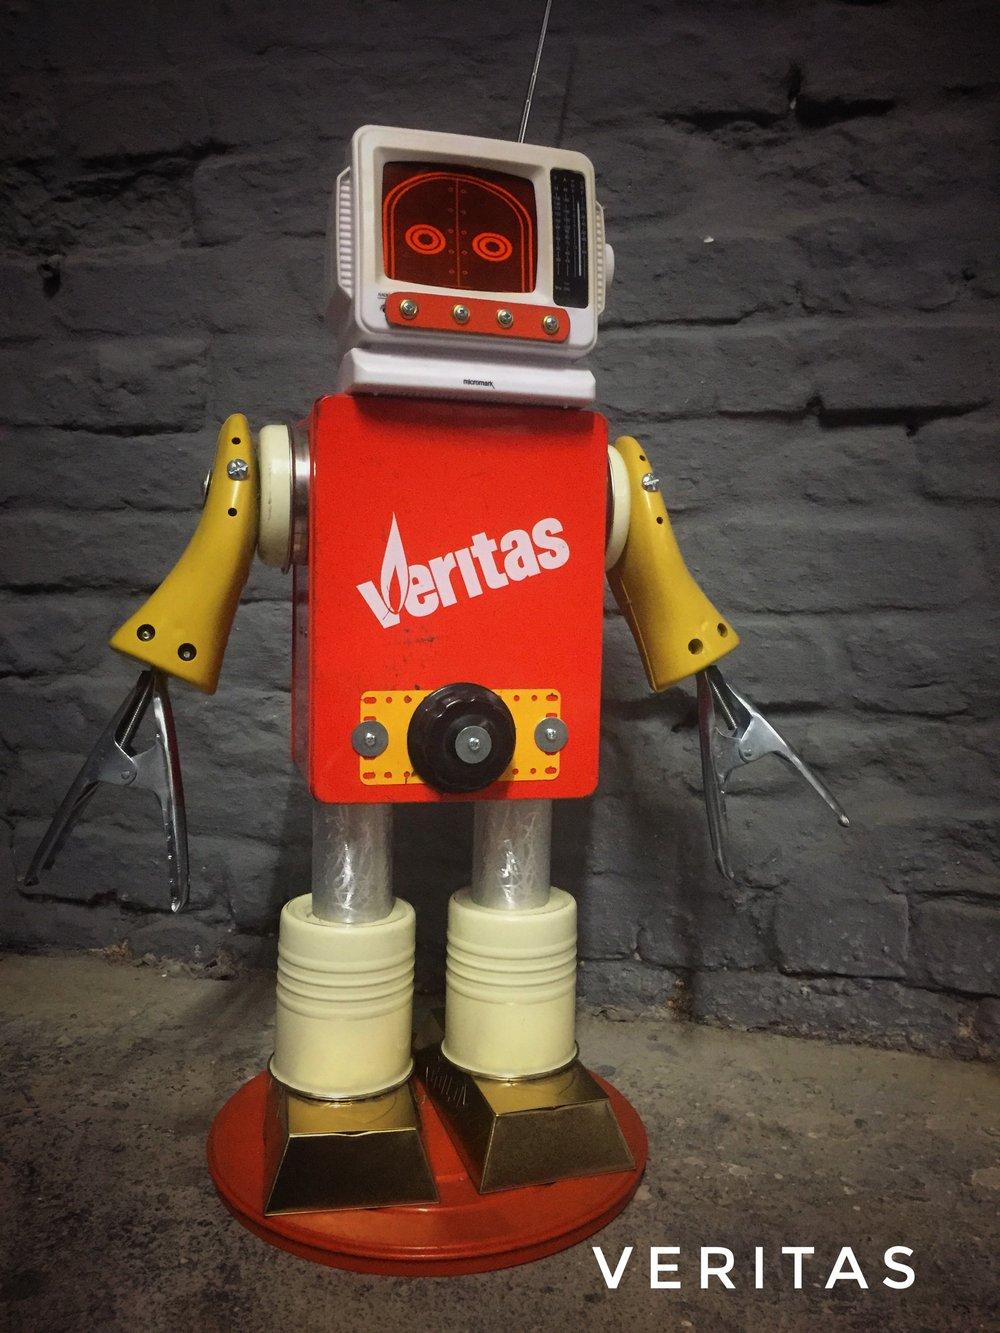 Image of Veritas